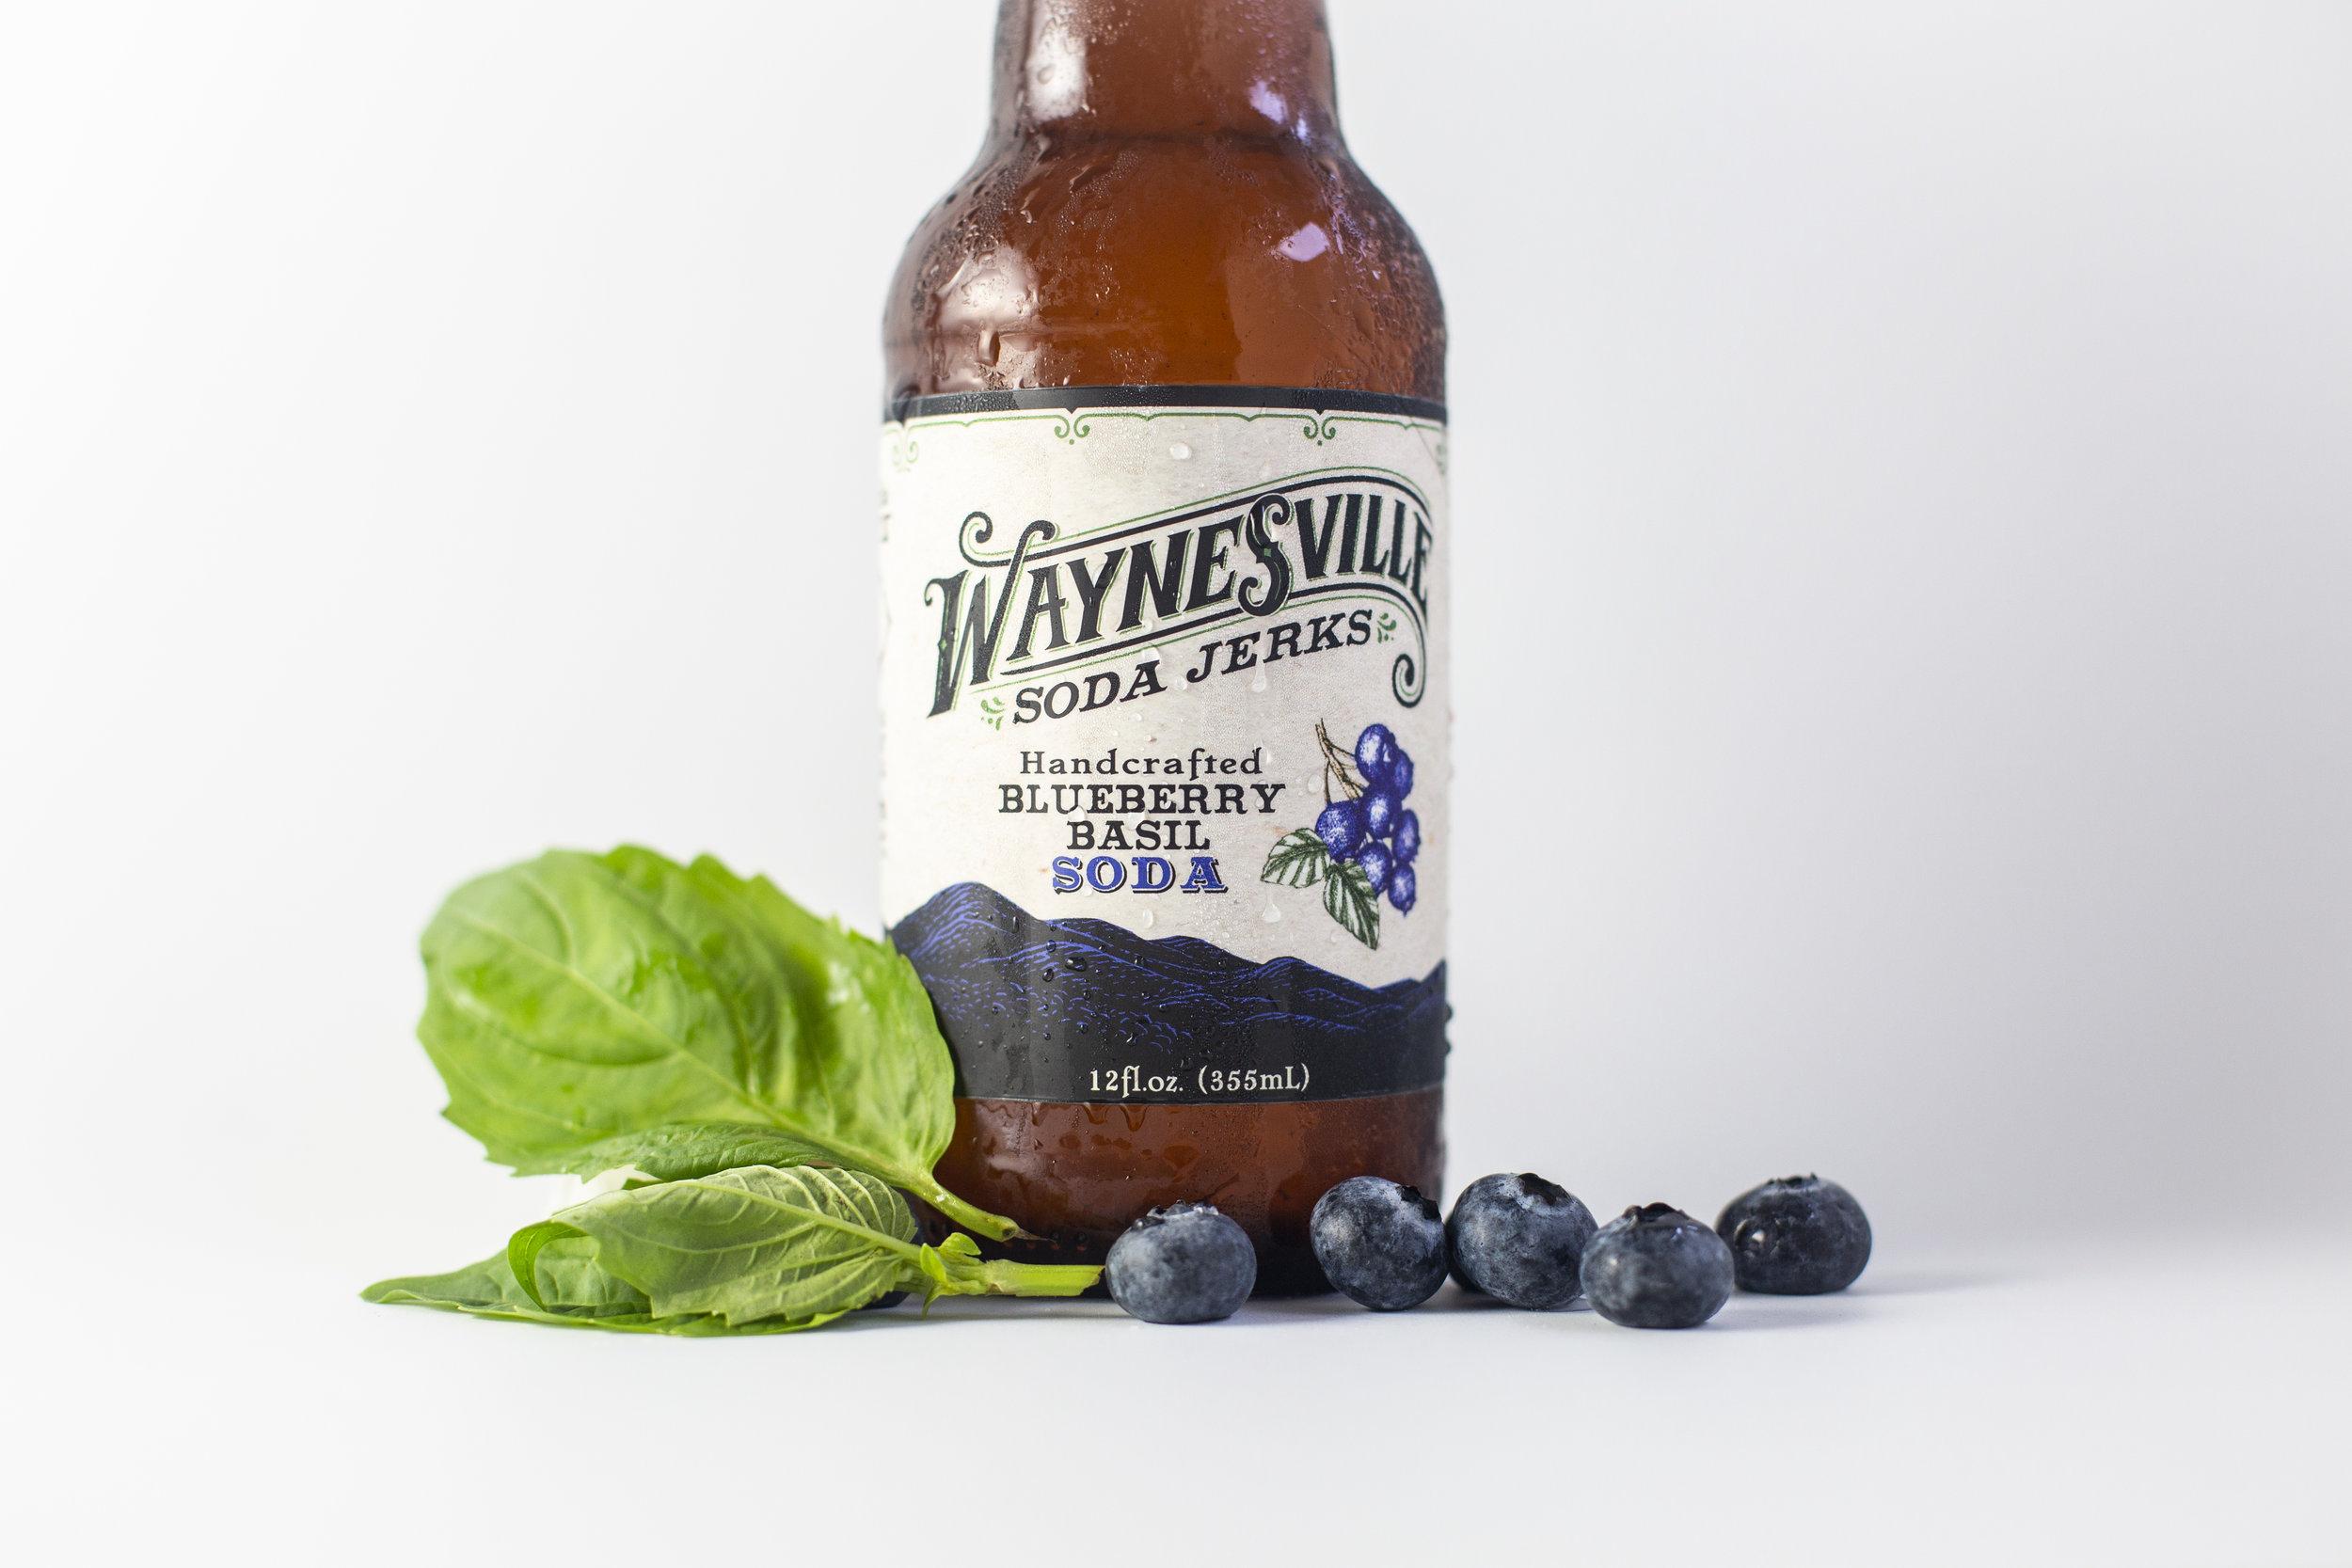 Waynesville Soda Jerks